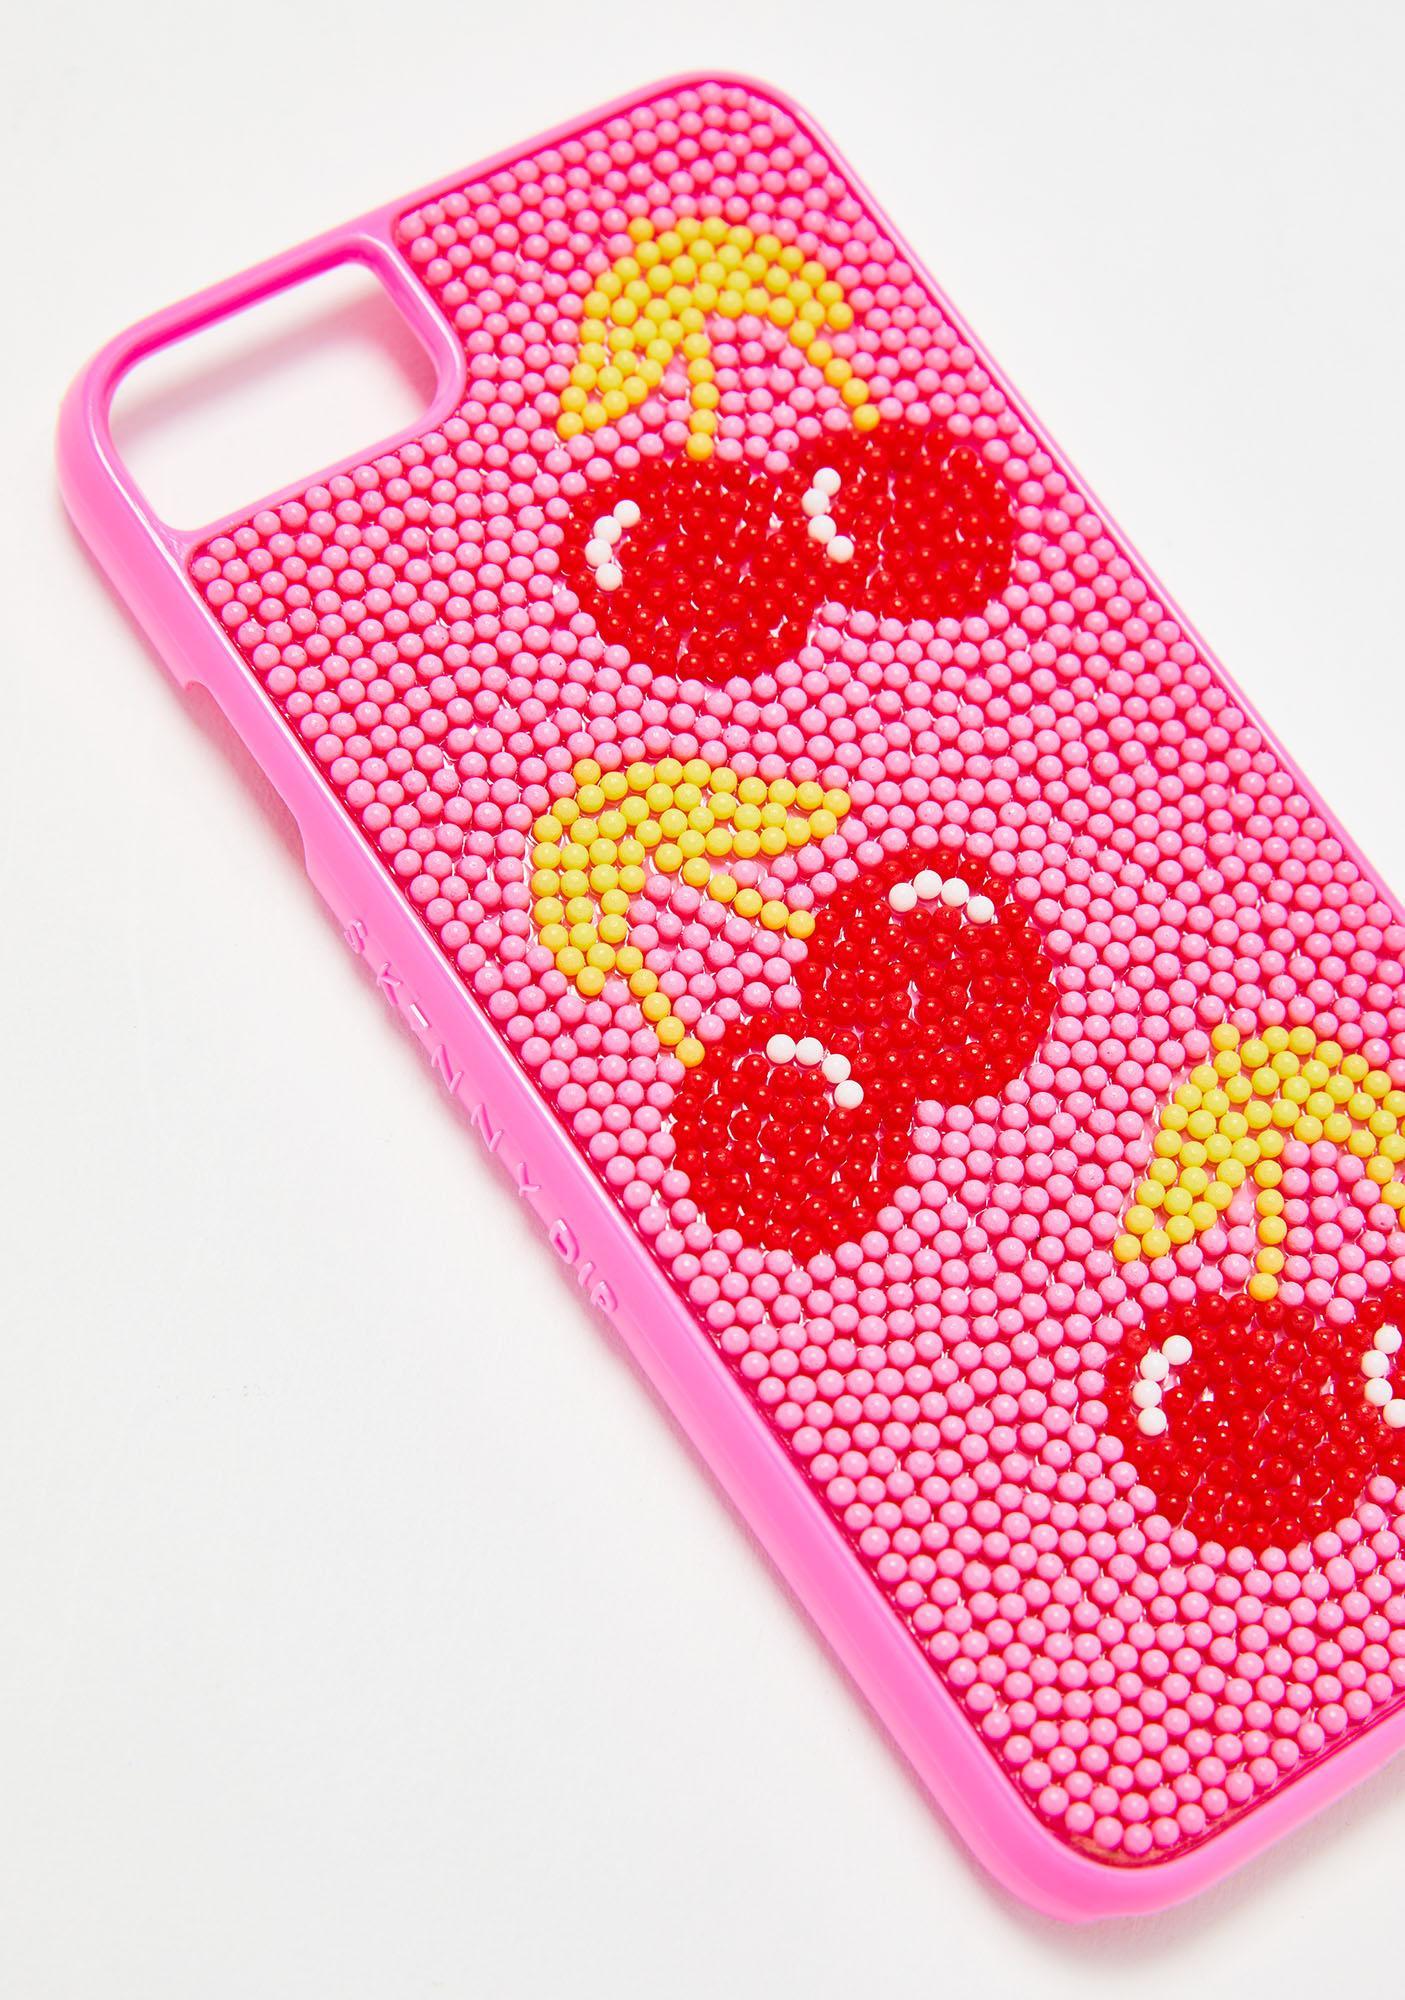 Skinnydip Cherry Bead Case